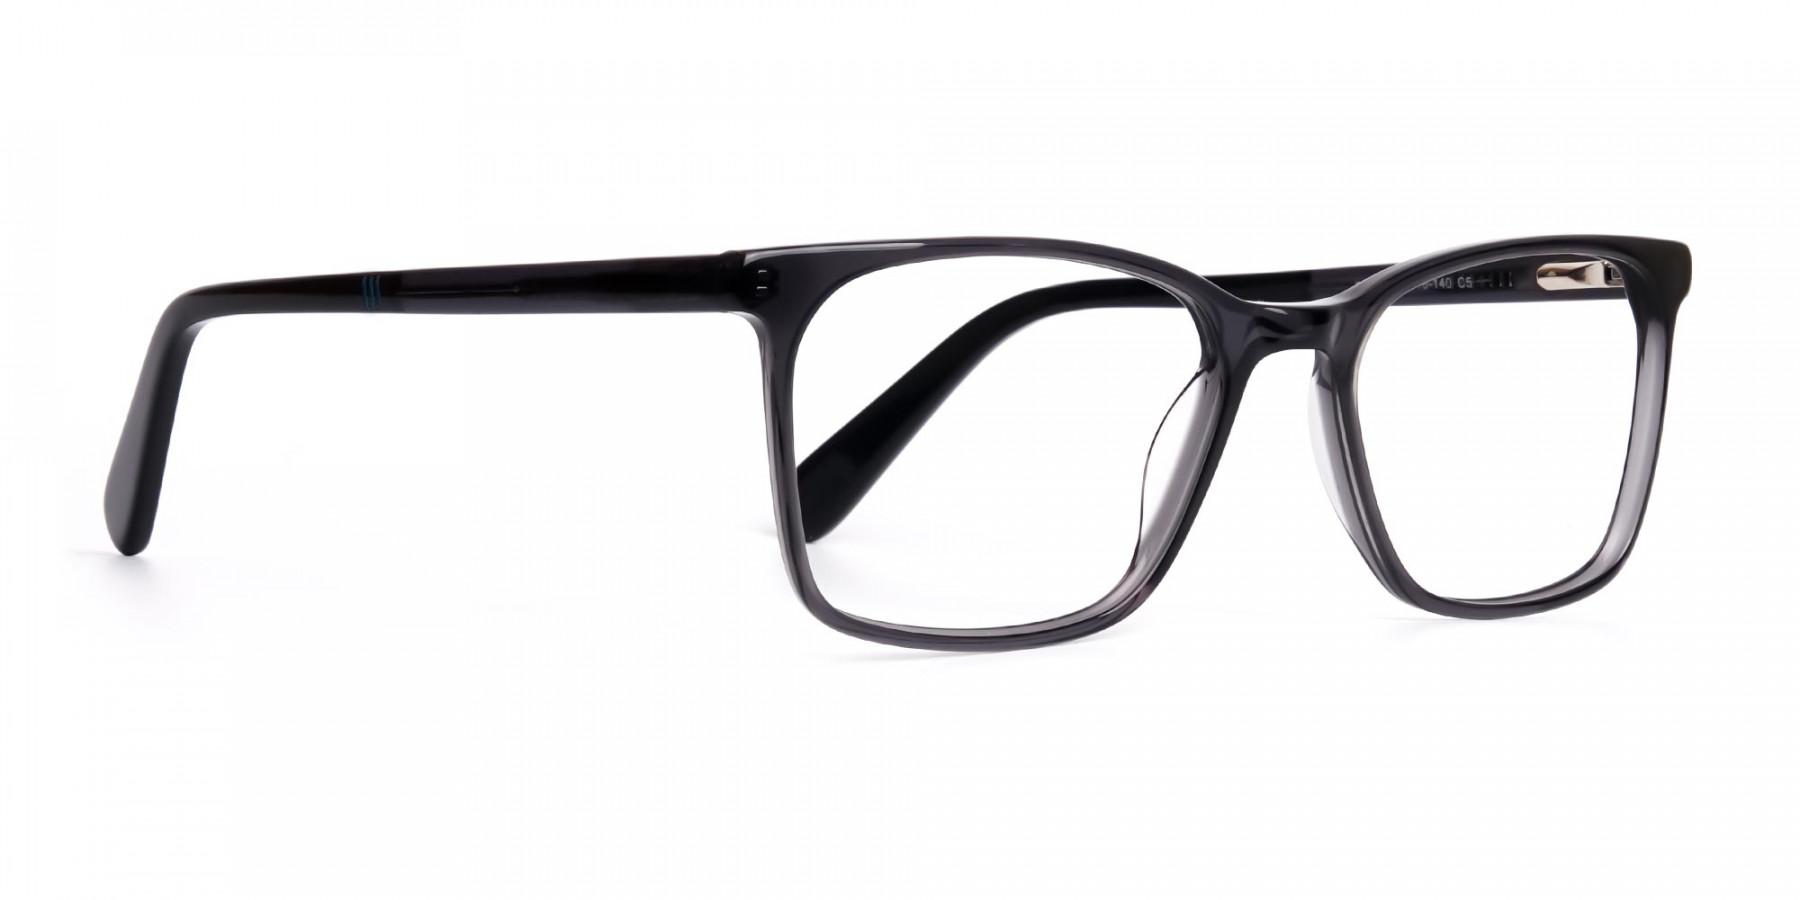 dark-grey-full-rim-rectangular-glasses-1